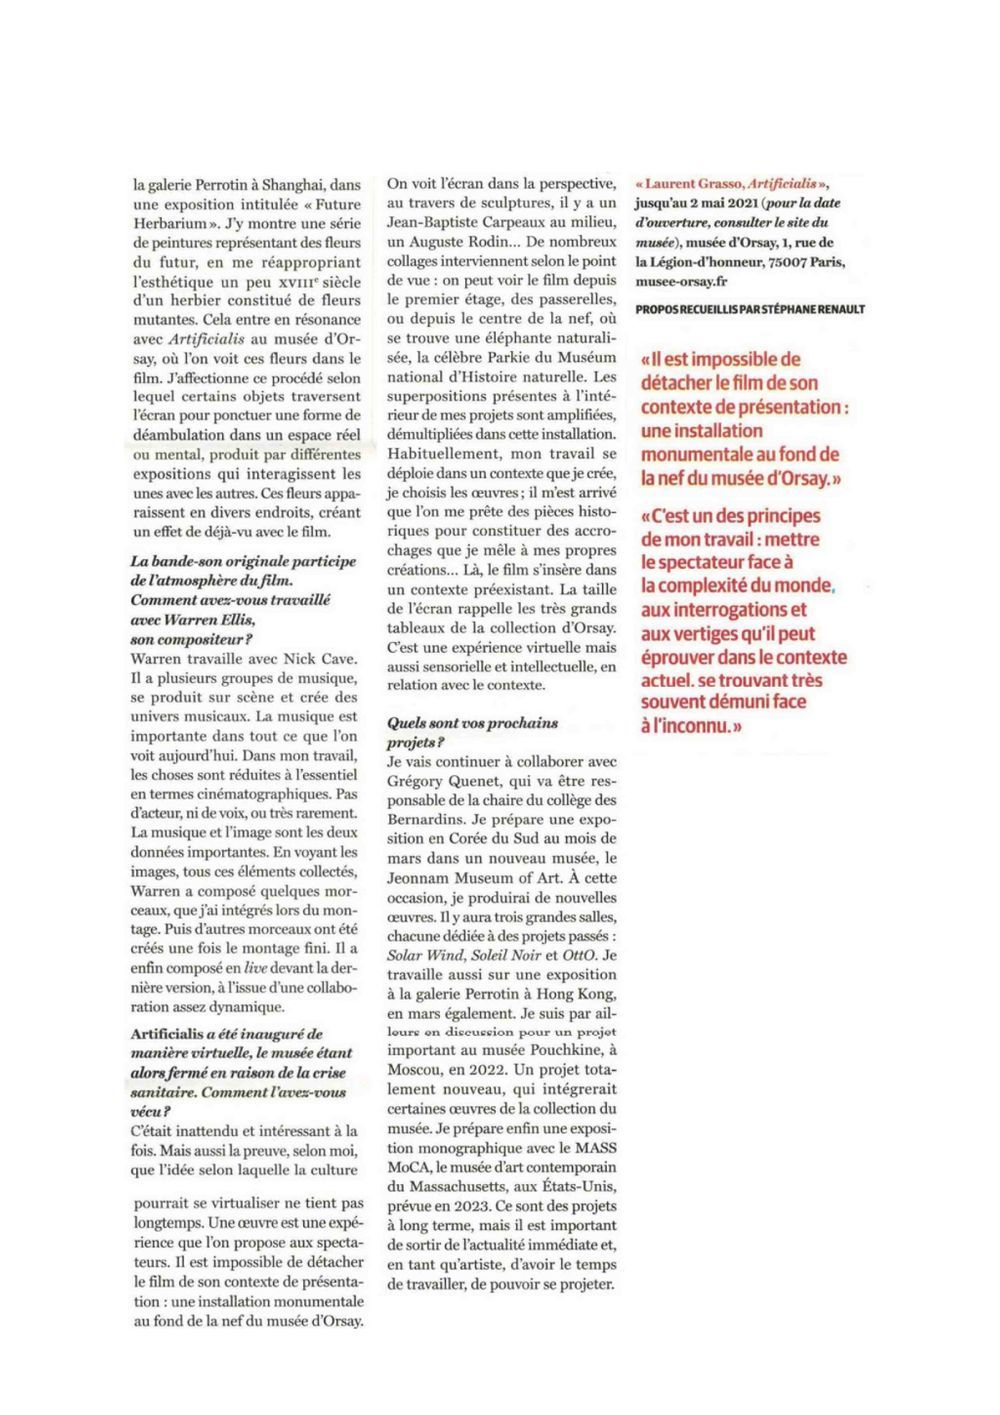 The Art Newspaper | Laurent GRASSO